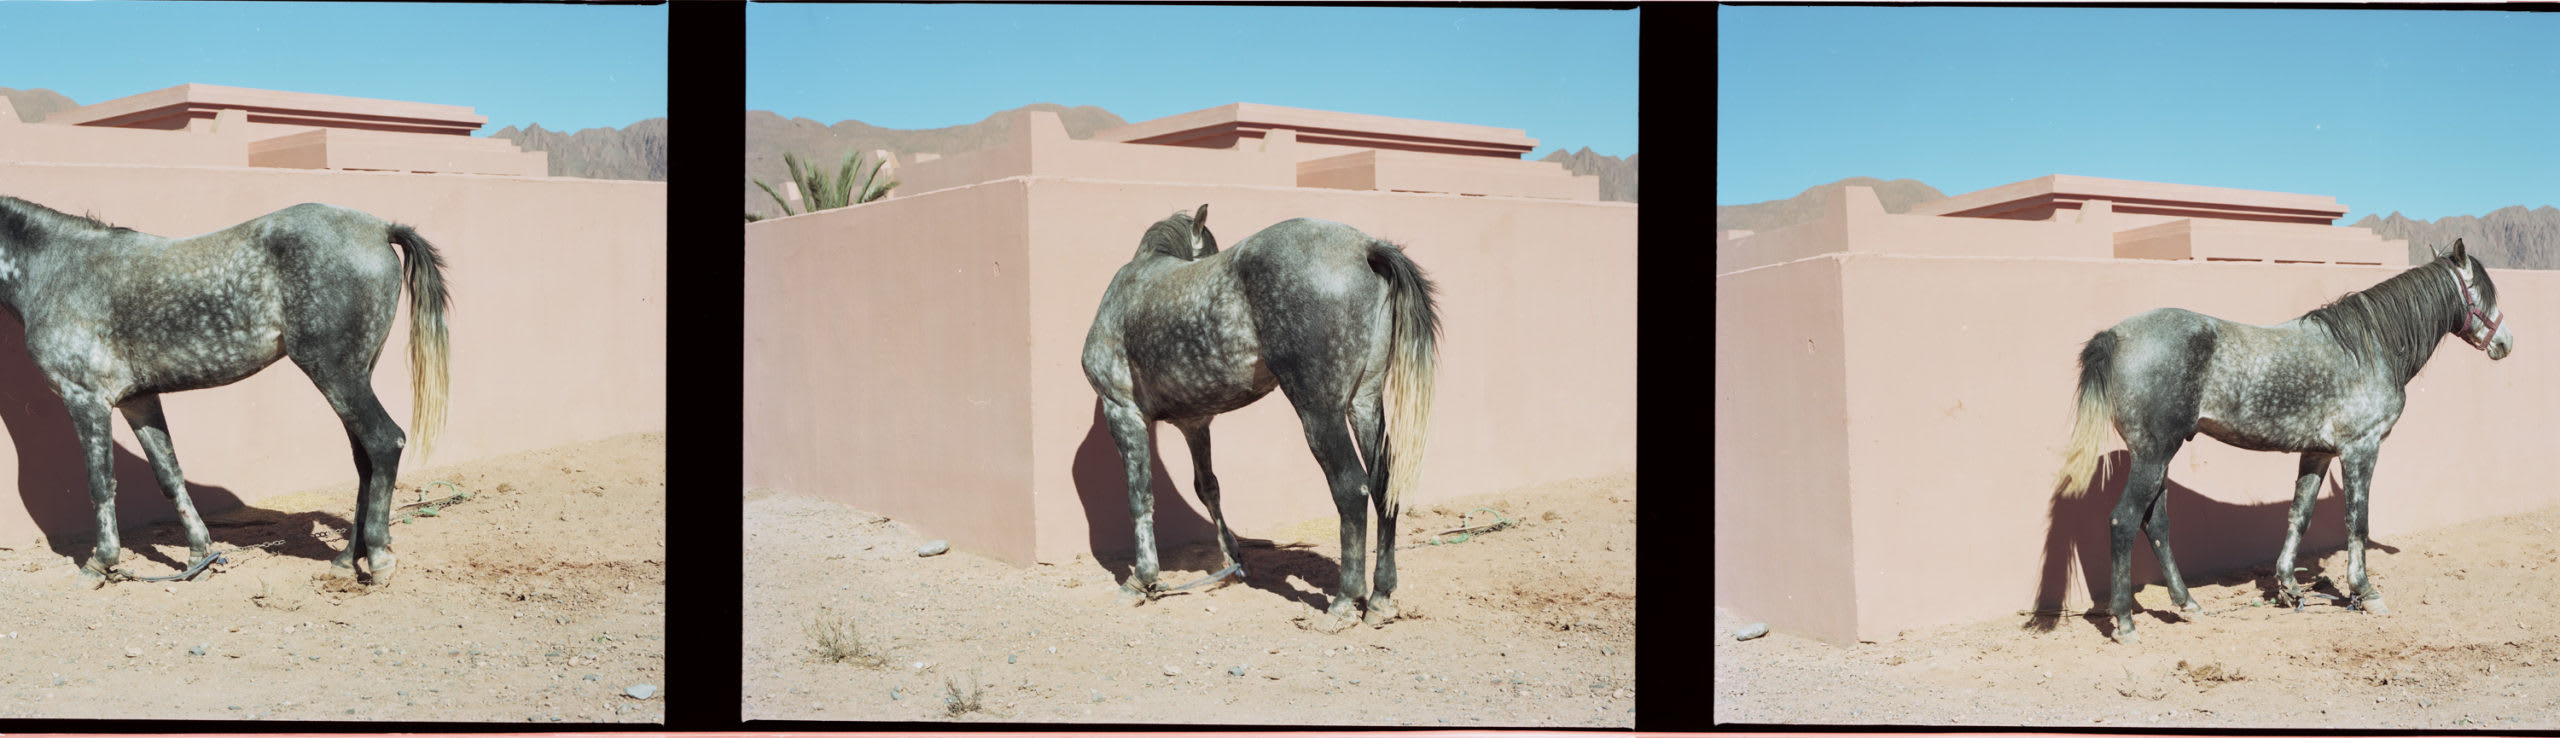 bidules-latest-prends soin de toi Victor Pattyn Maroc